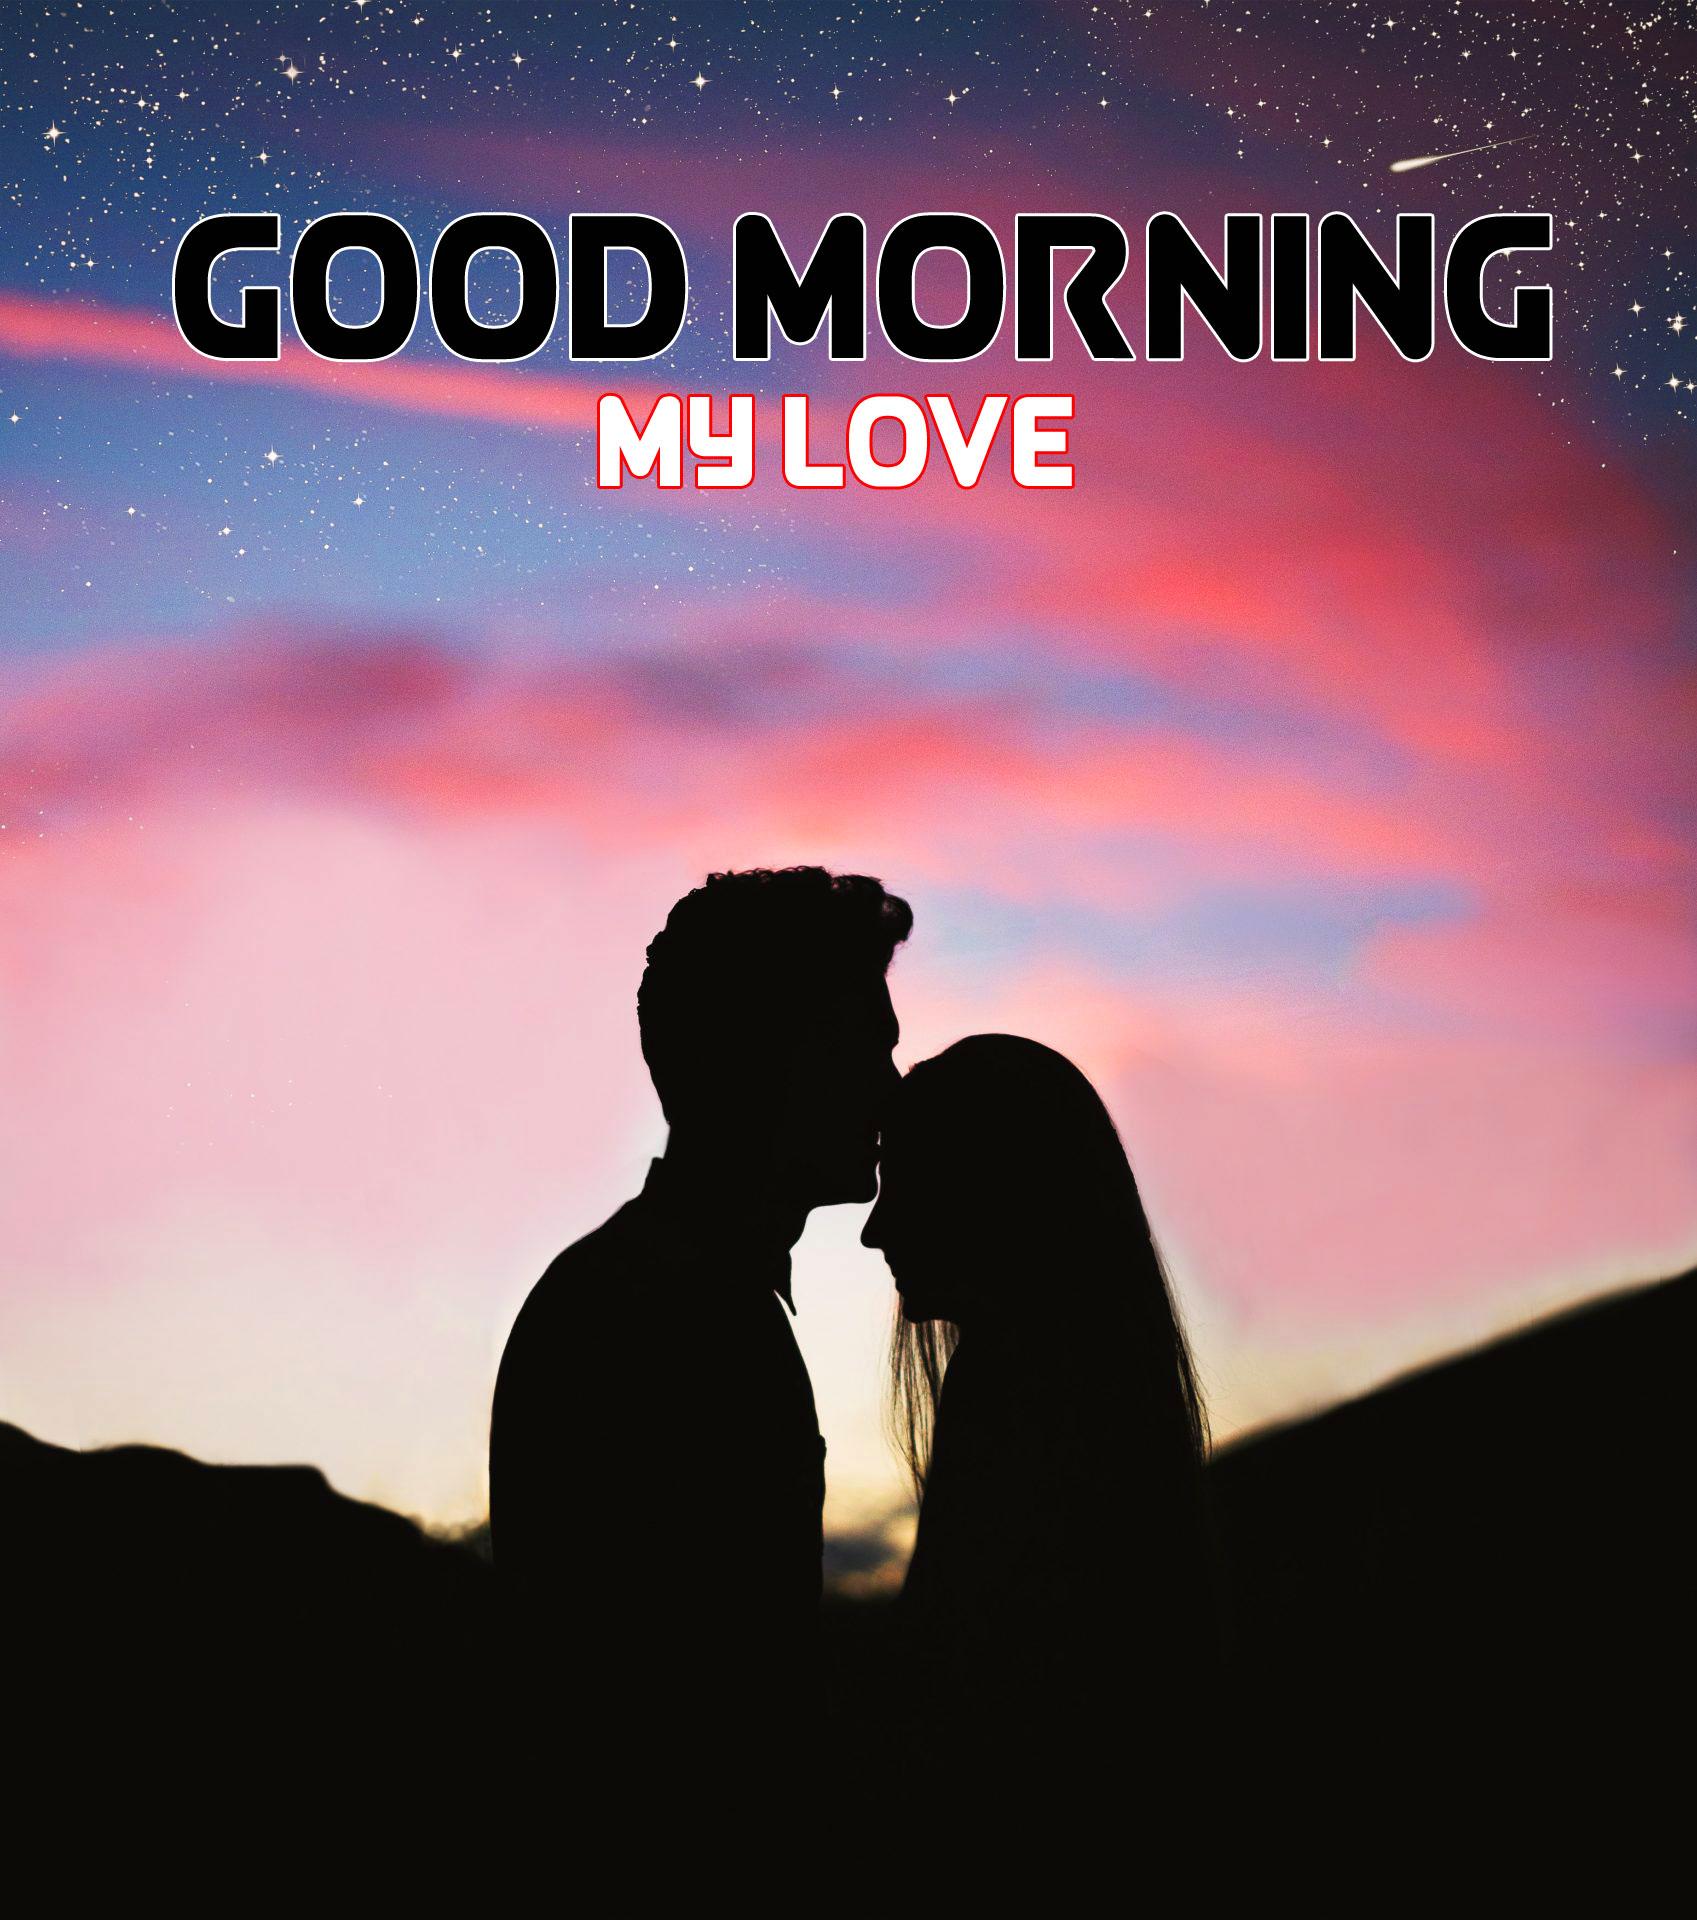 Free HD Romantic Good Morning Images